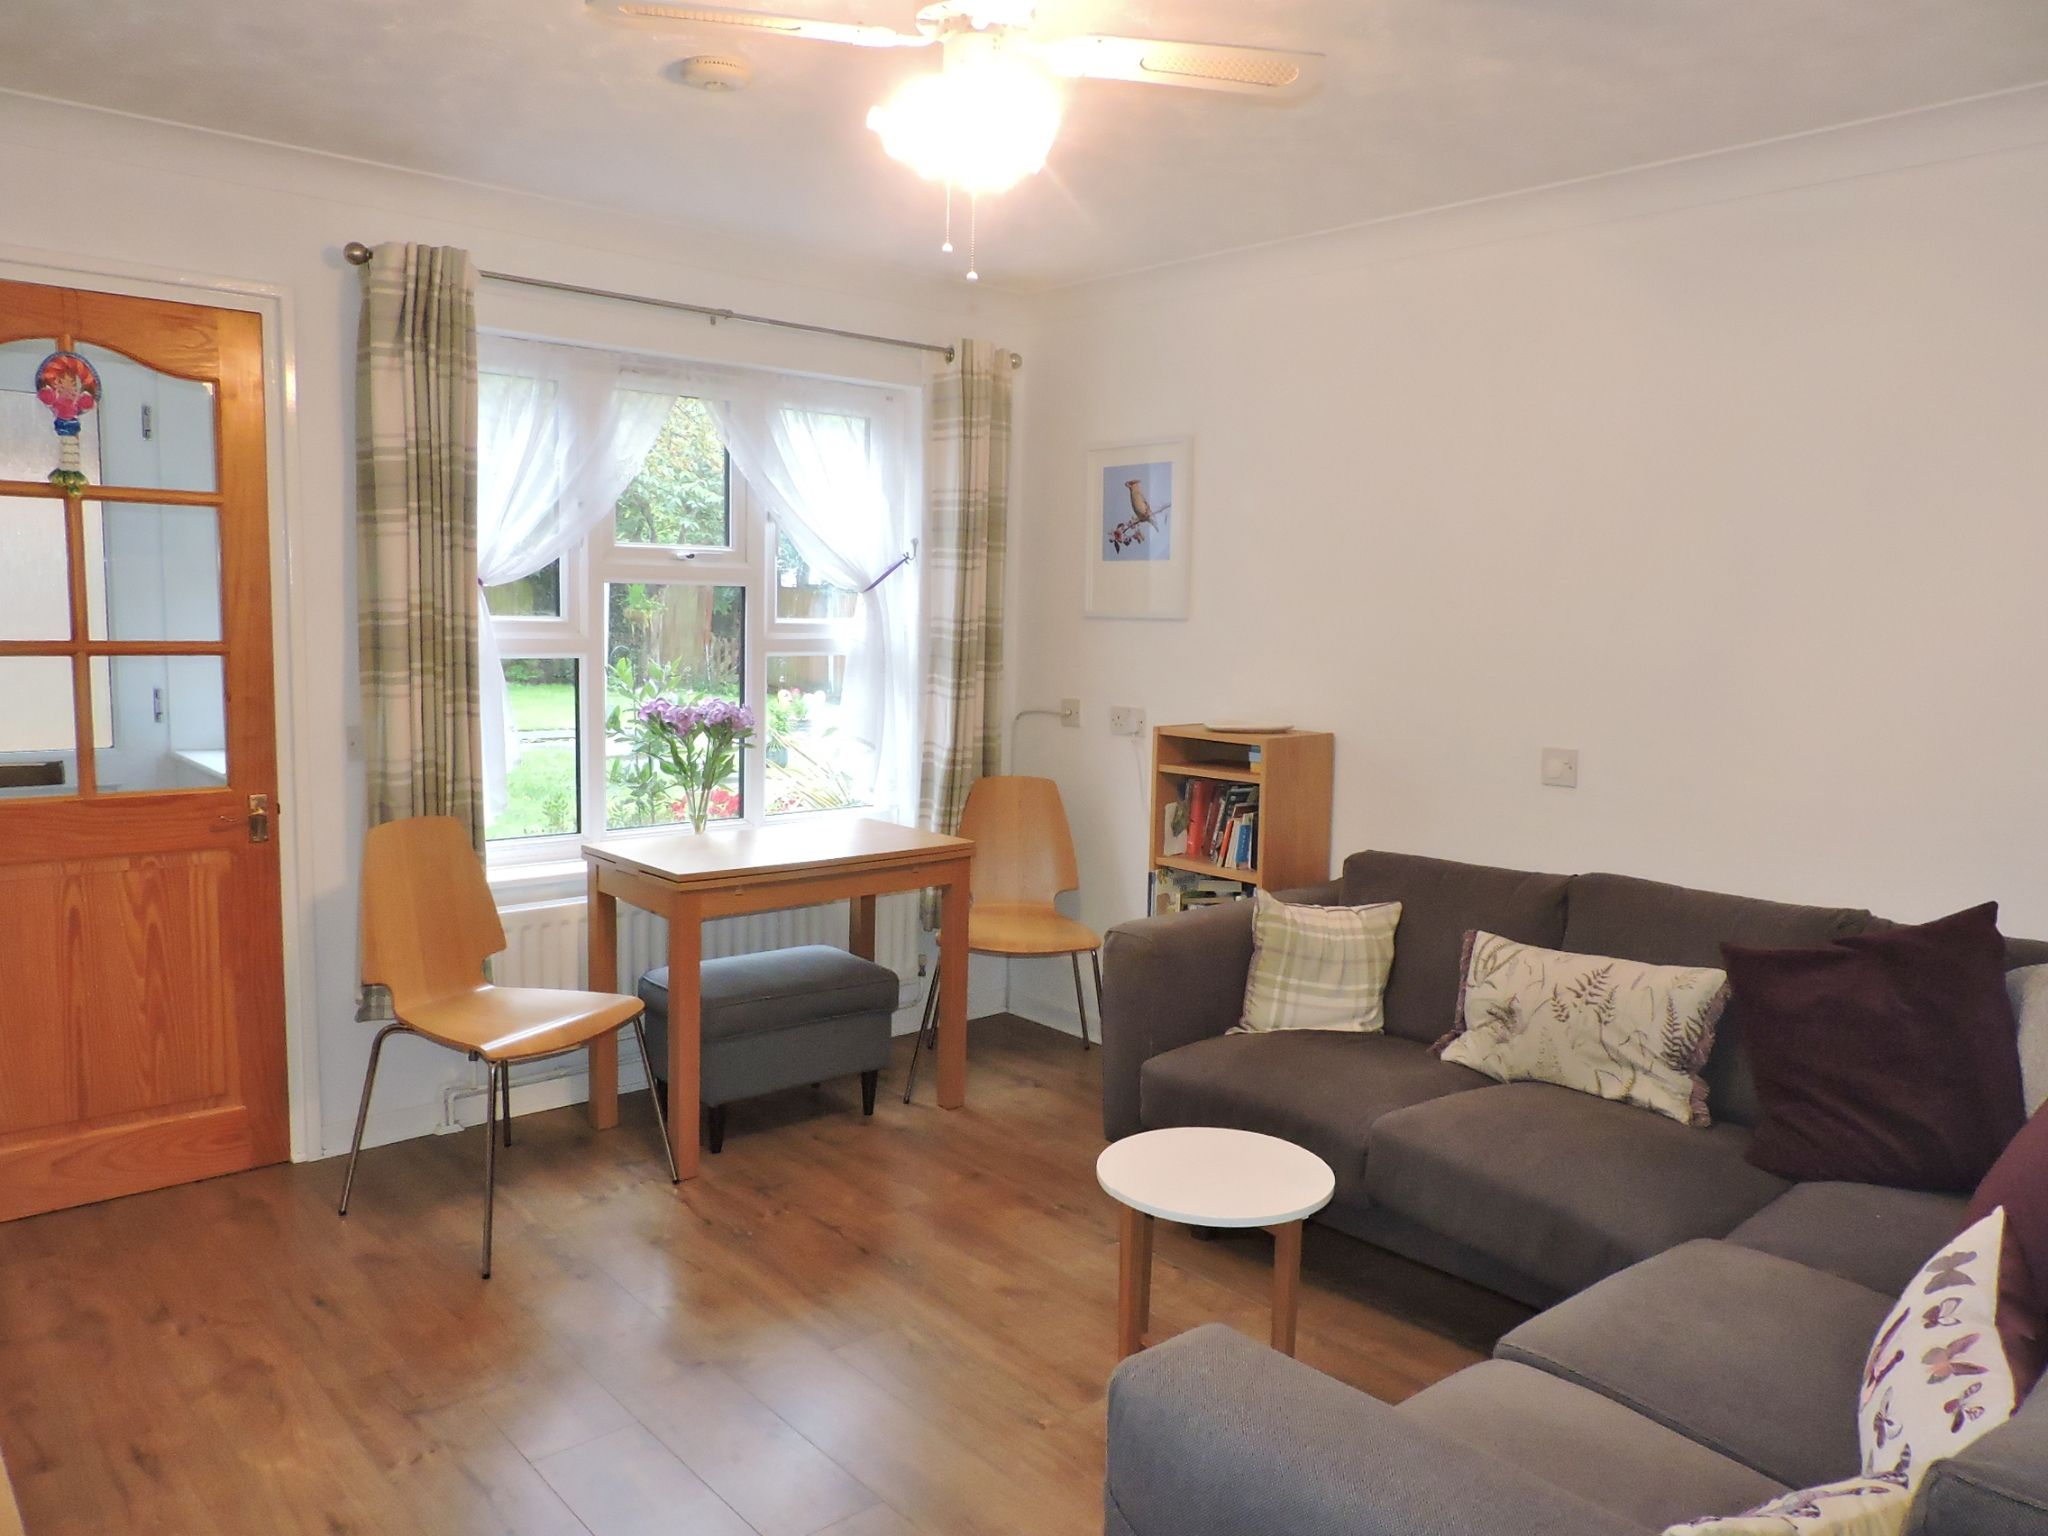 1 bedroom ground floor maisonette flat/apartment Sale Agreed in New Malden - Photograph 2